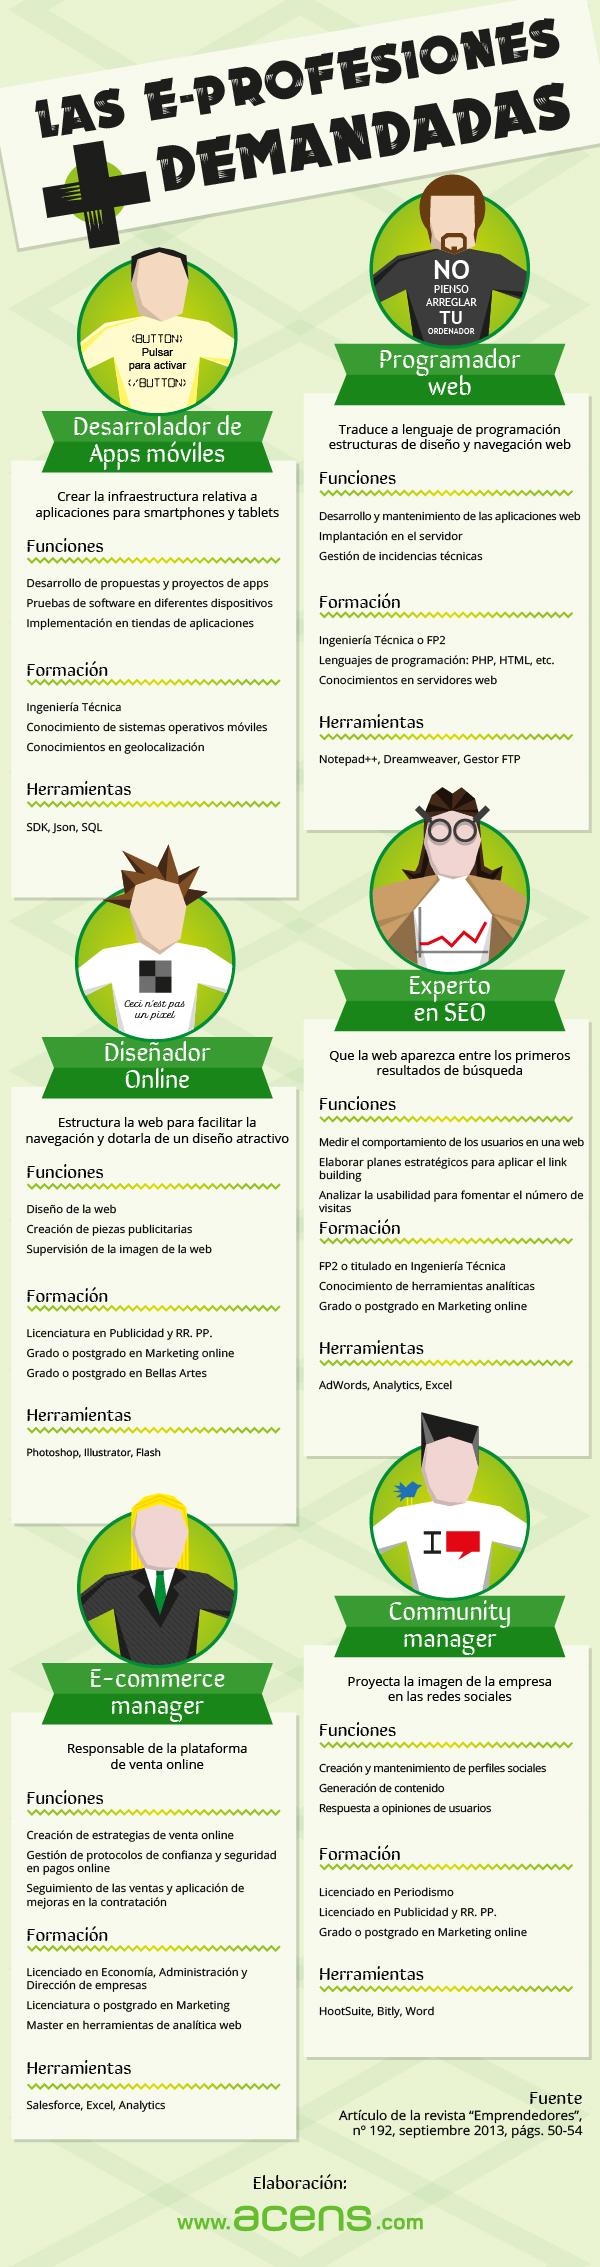 infografia-eprofesiones-mas-buscadas-blog-jesus-marrone